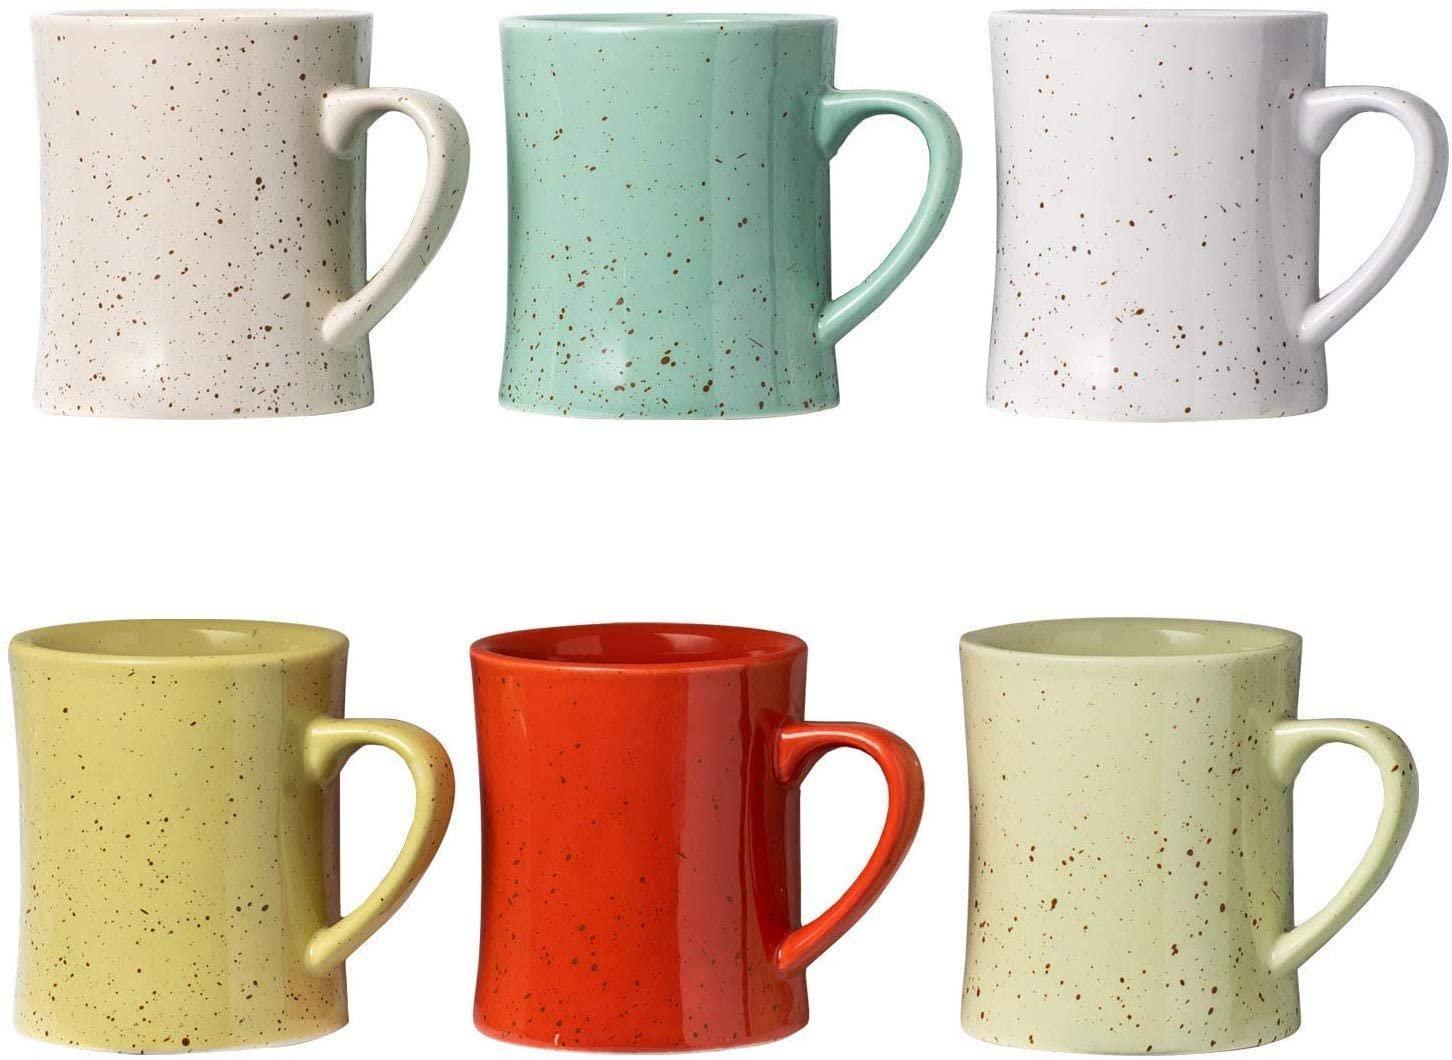 Cottage Gifts - Farmhouse Mugs